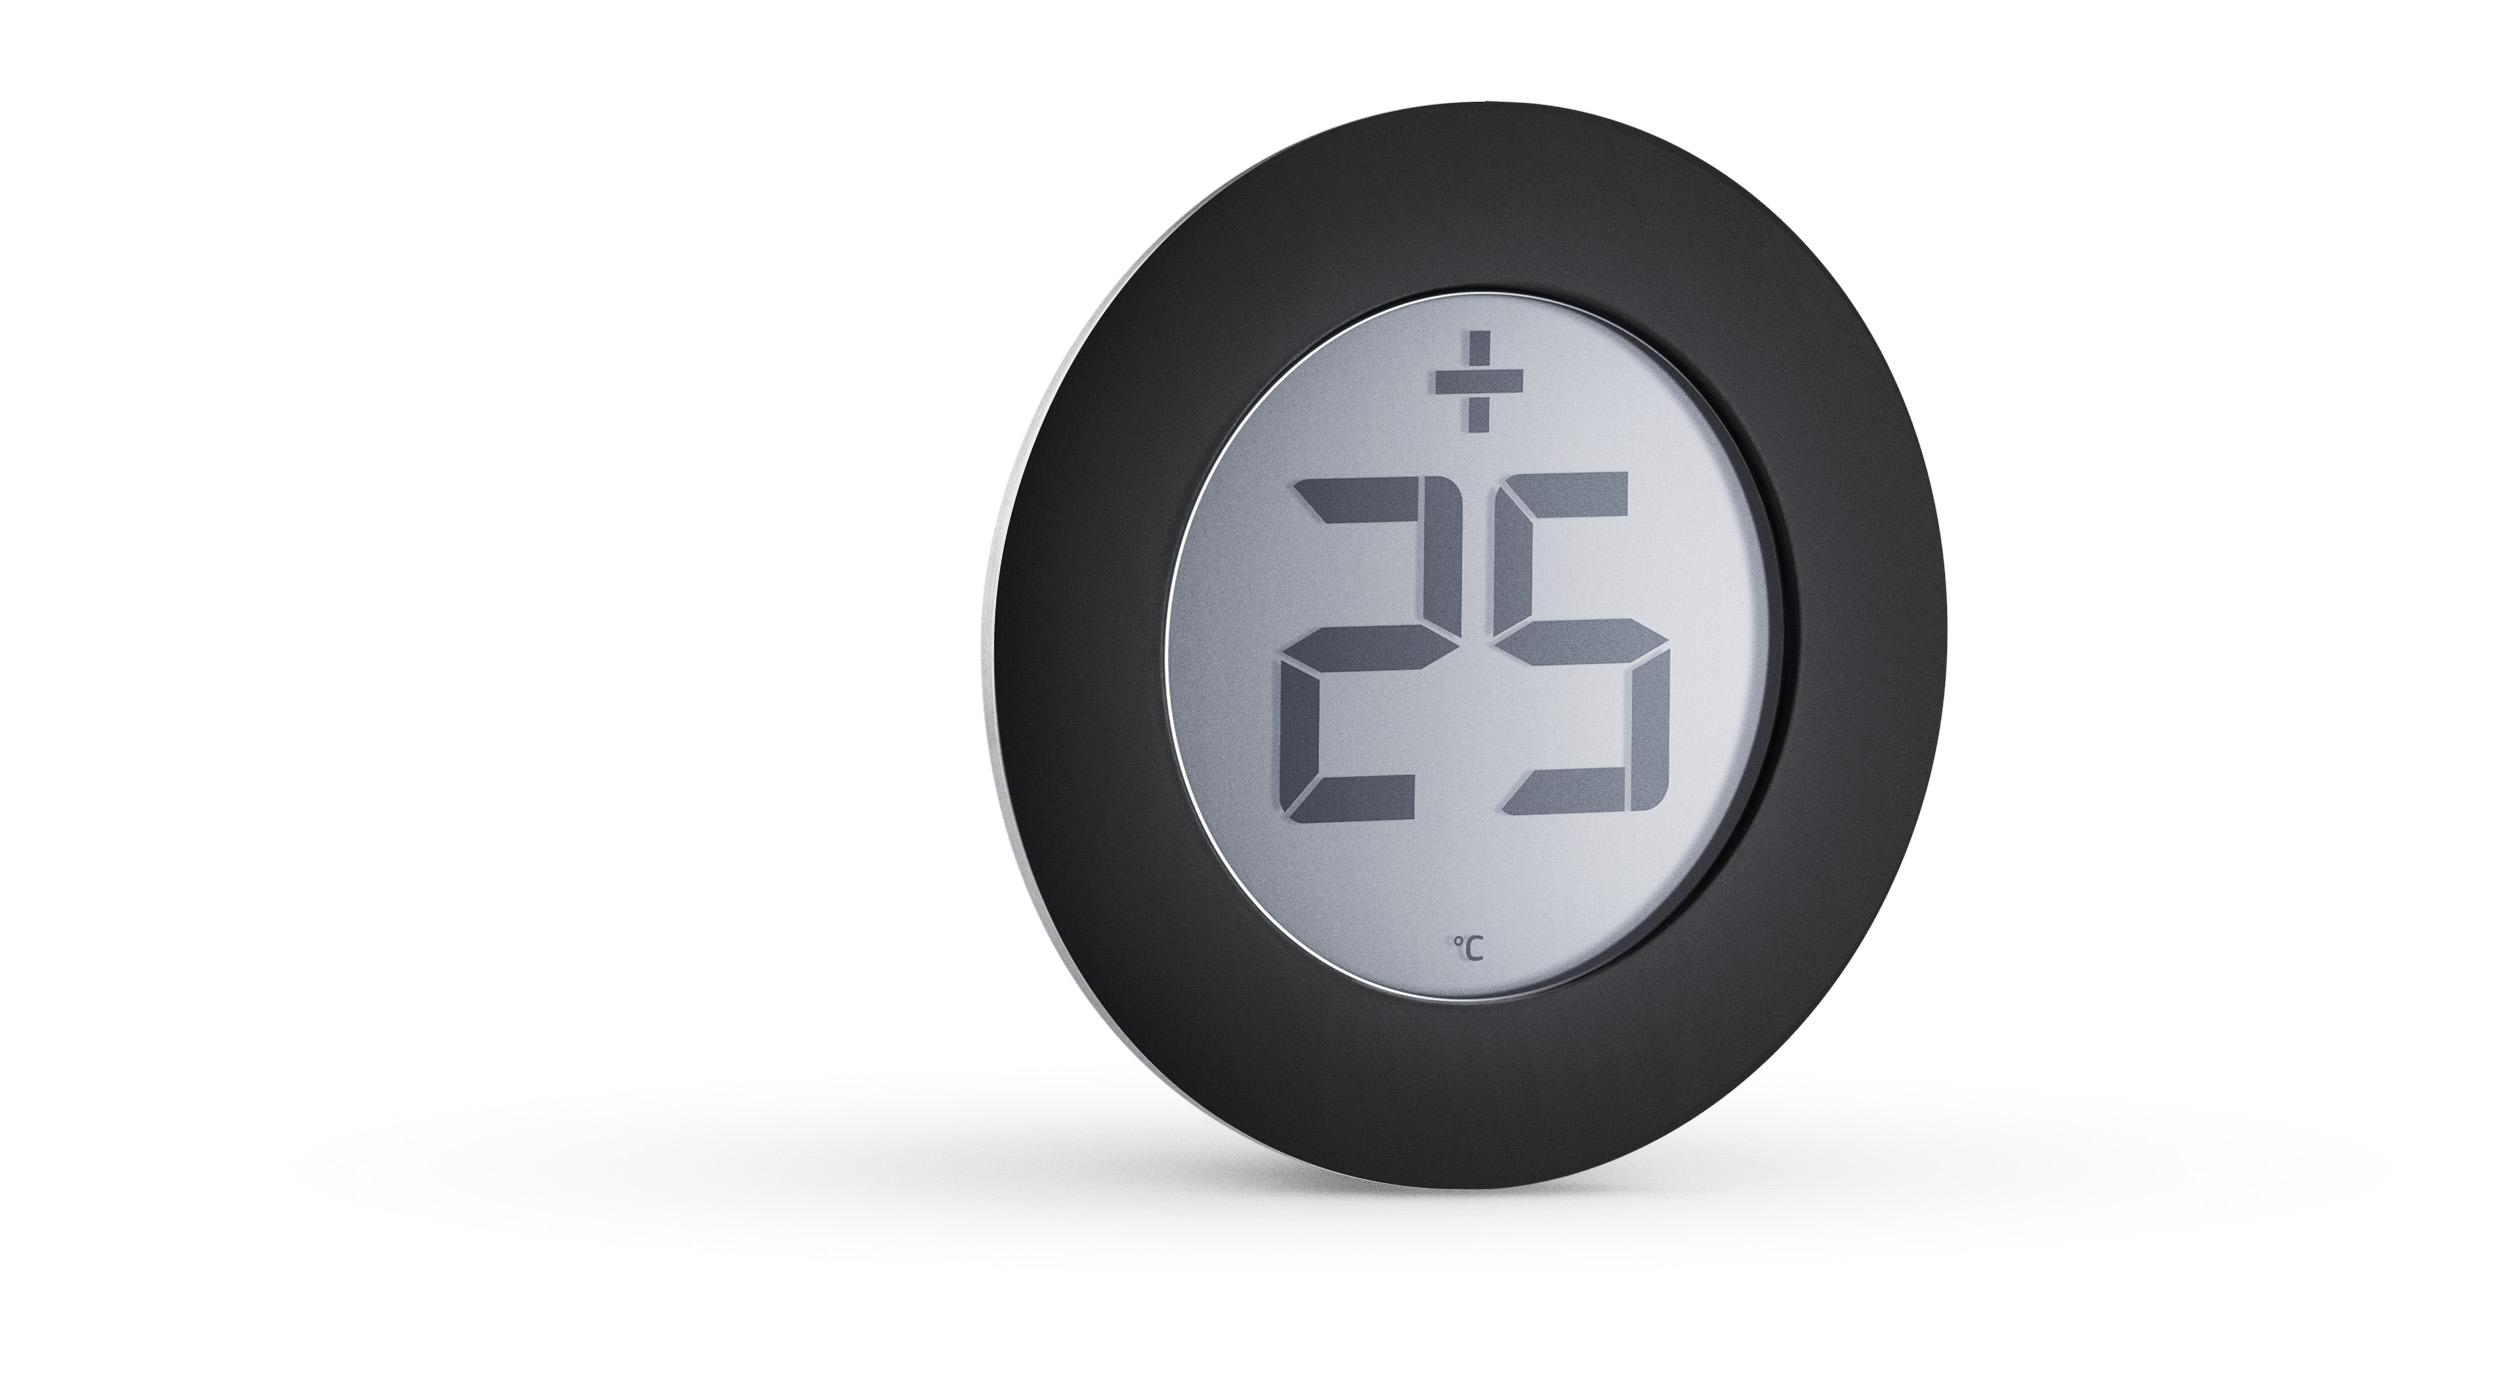 Eva Solo - Digital Outdoor Thermometer New Model (567768)